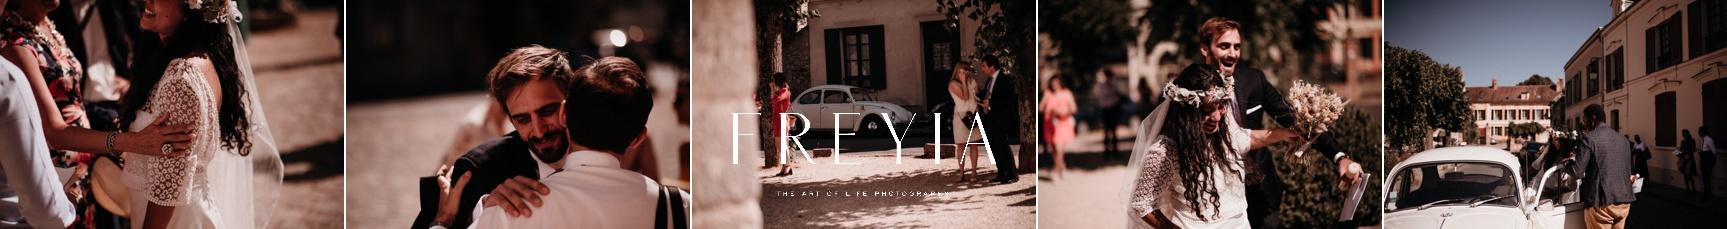 R + T |  mariage reportage alternatif moody intime minimaliste vintage naturel boho boheme |  PHOTOGRAPHE mariage PARIS france destination  | FREYIA photography_-174.jpg